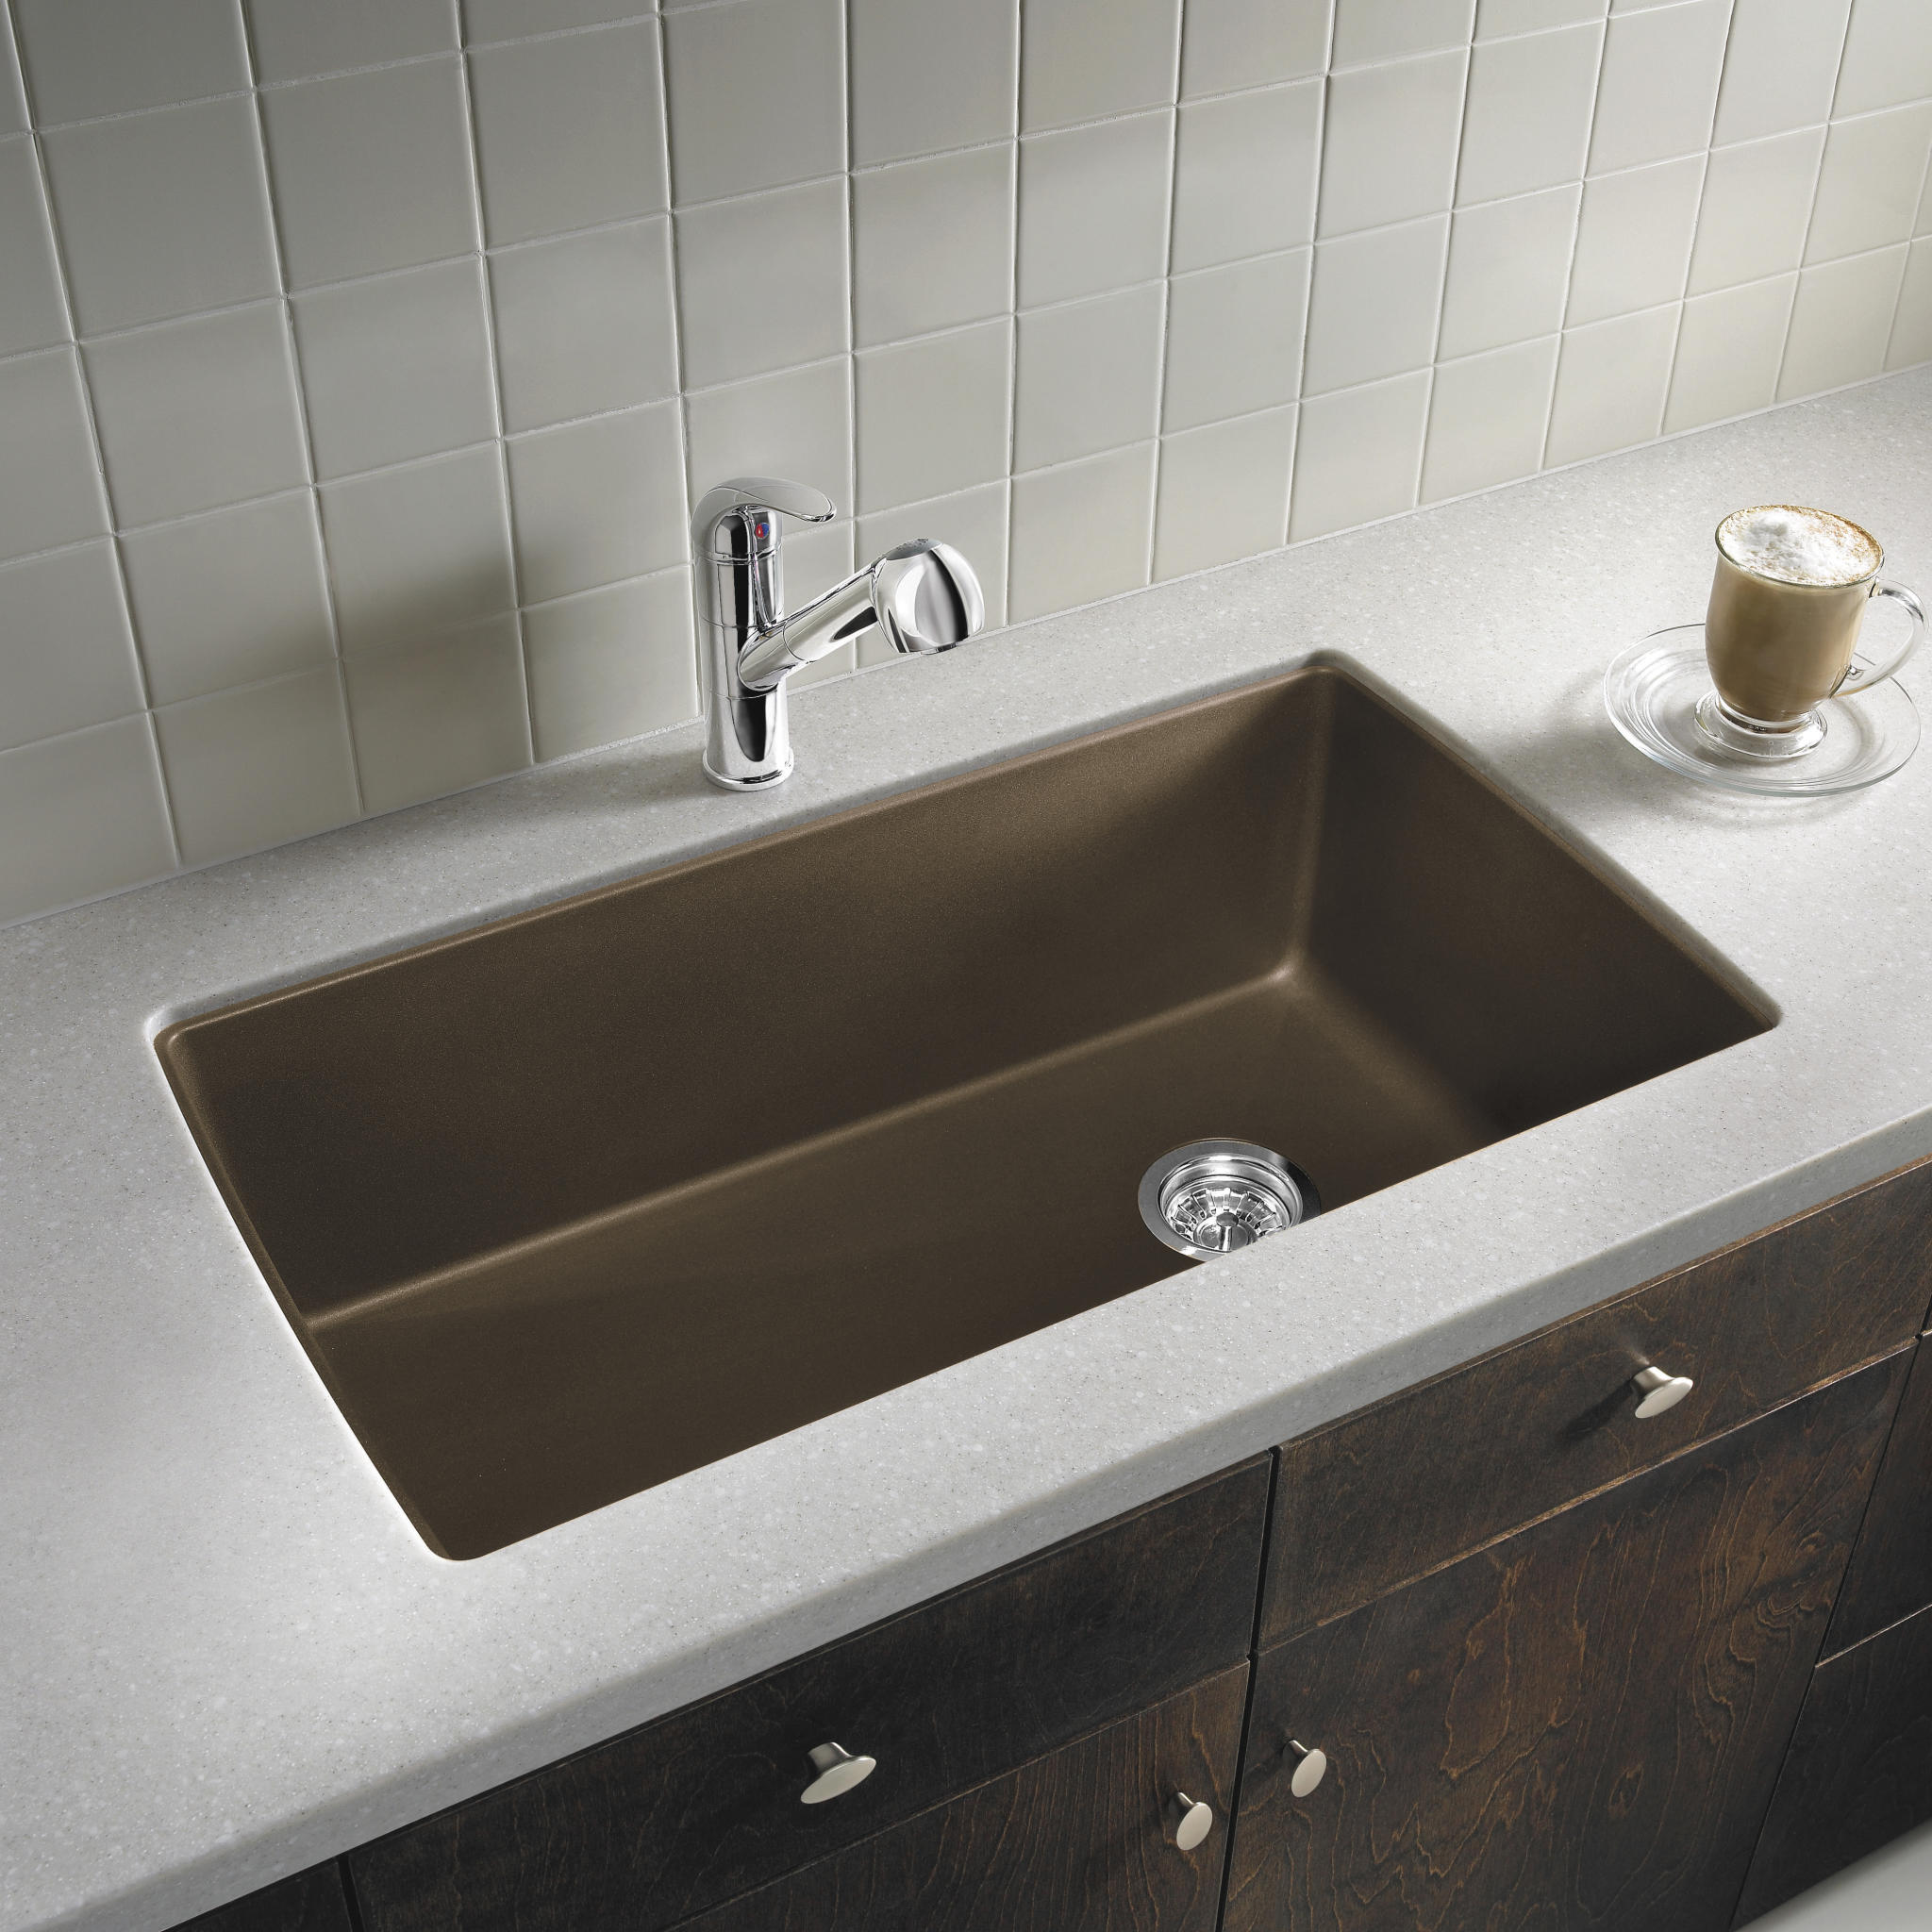 whats right sink size kitchen kitchen sink sizes Blanco 32 1 2 Diamond Super Single Bowl Sink